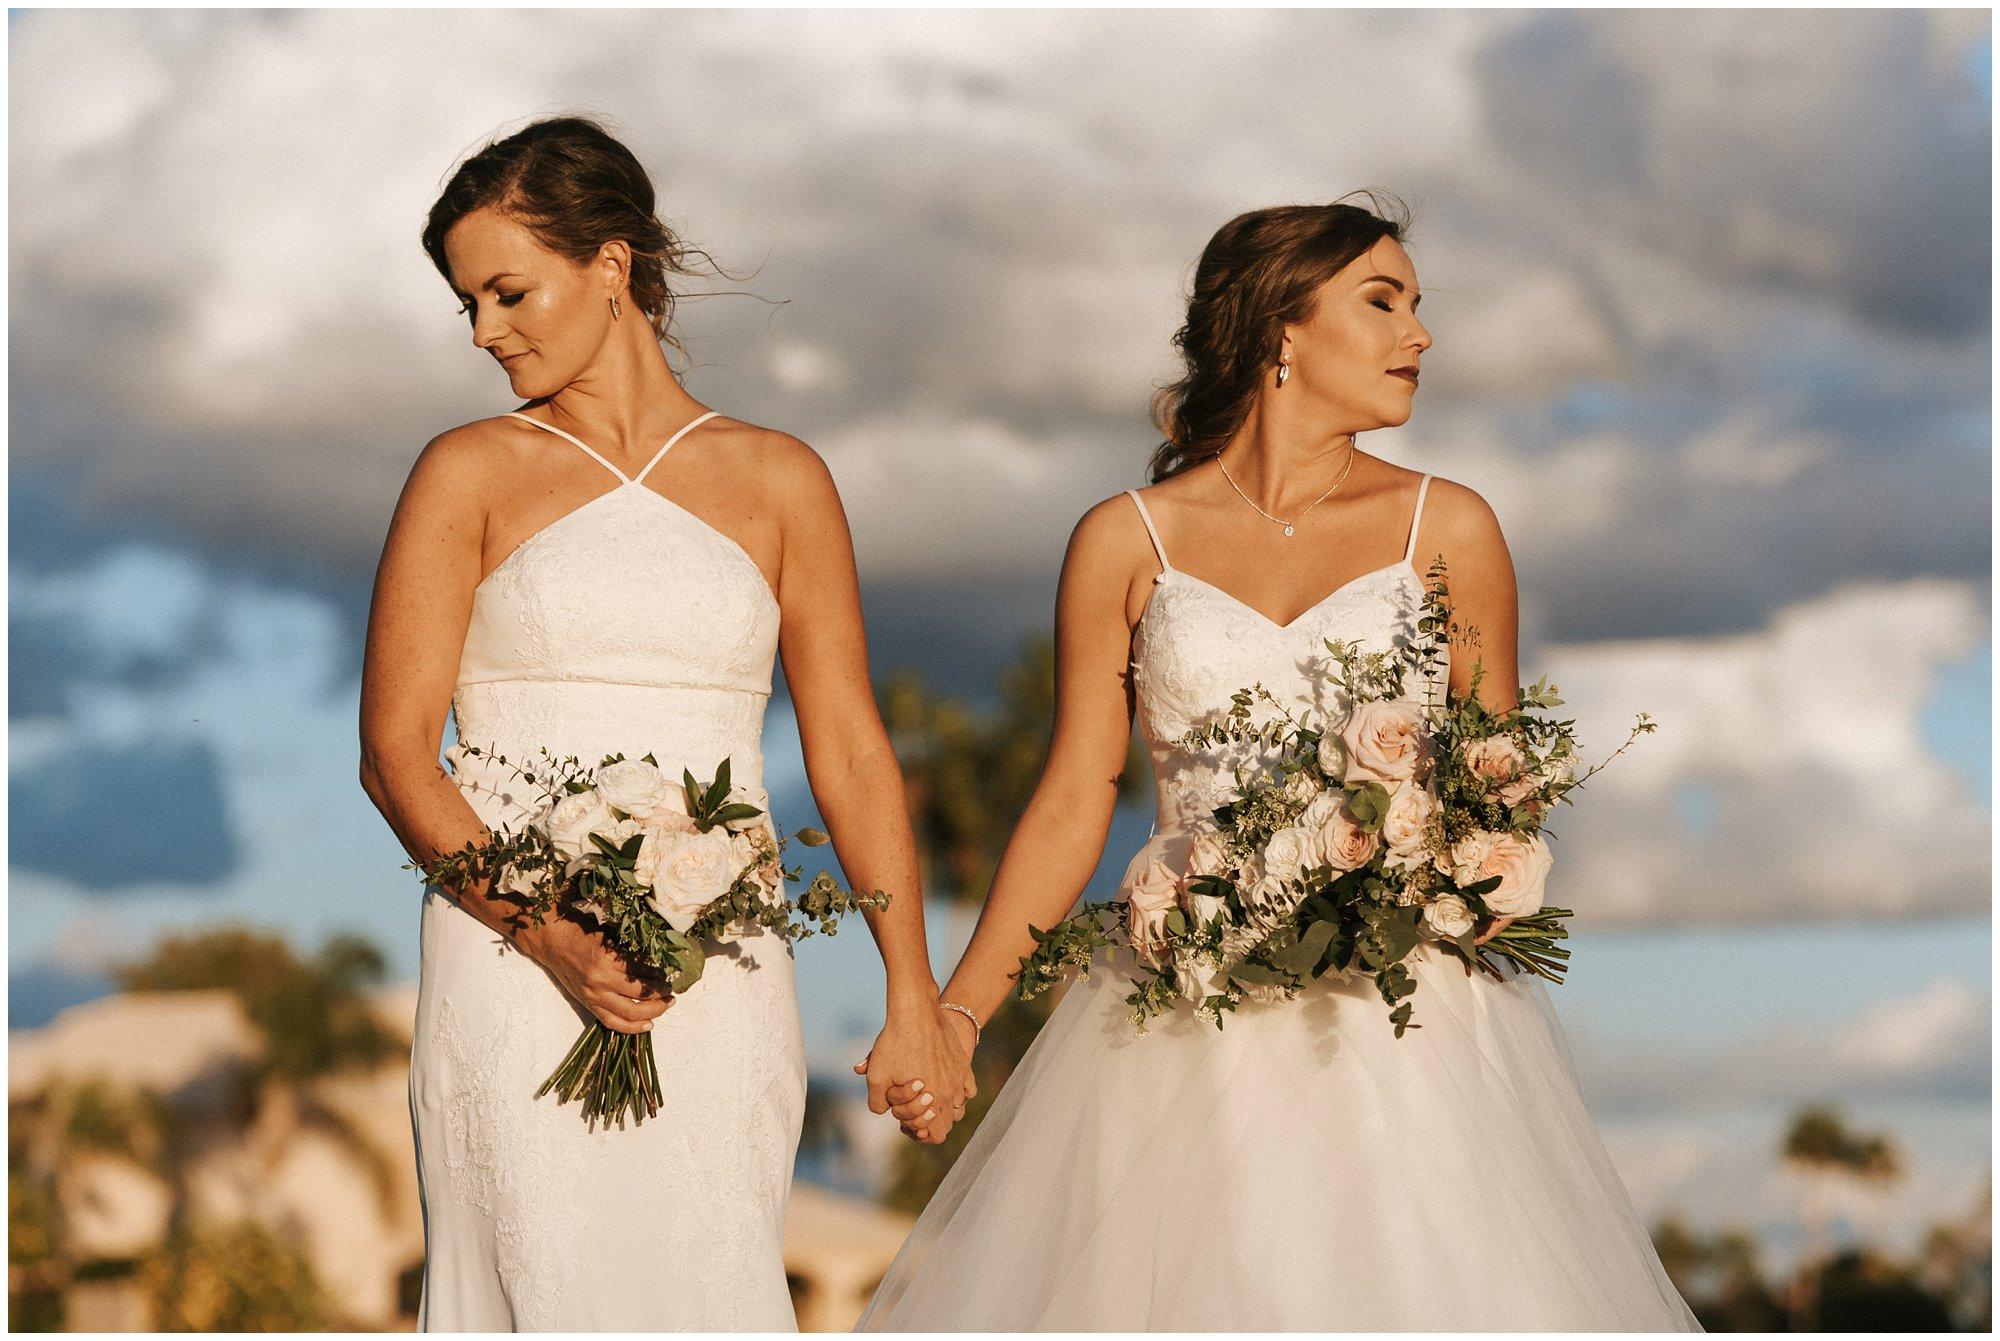 arizona same sex wedding photographer - jenni and lauren wedding the islands clubhouse_0080.jpg